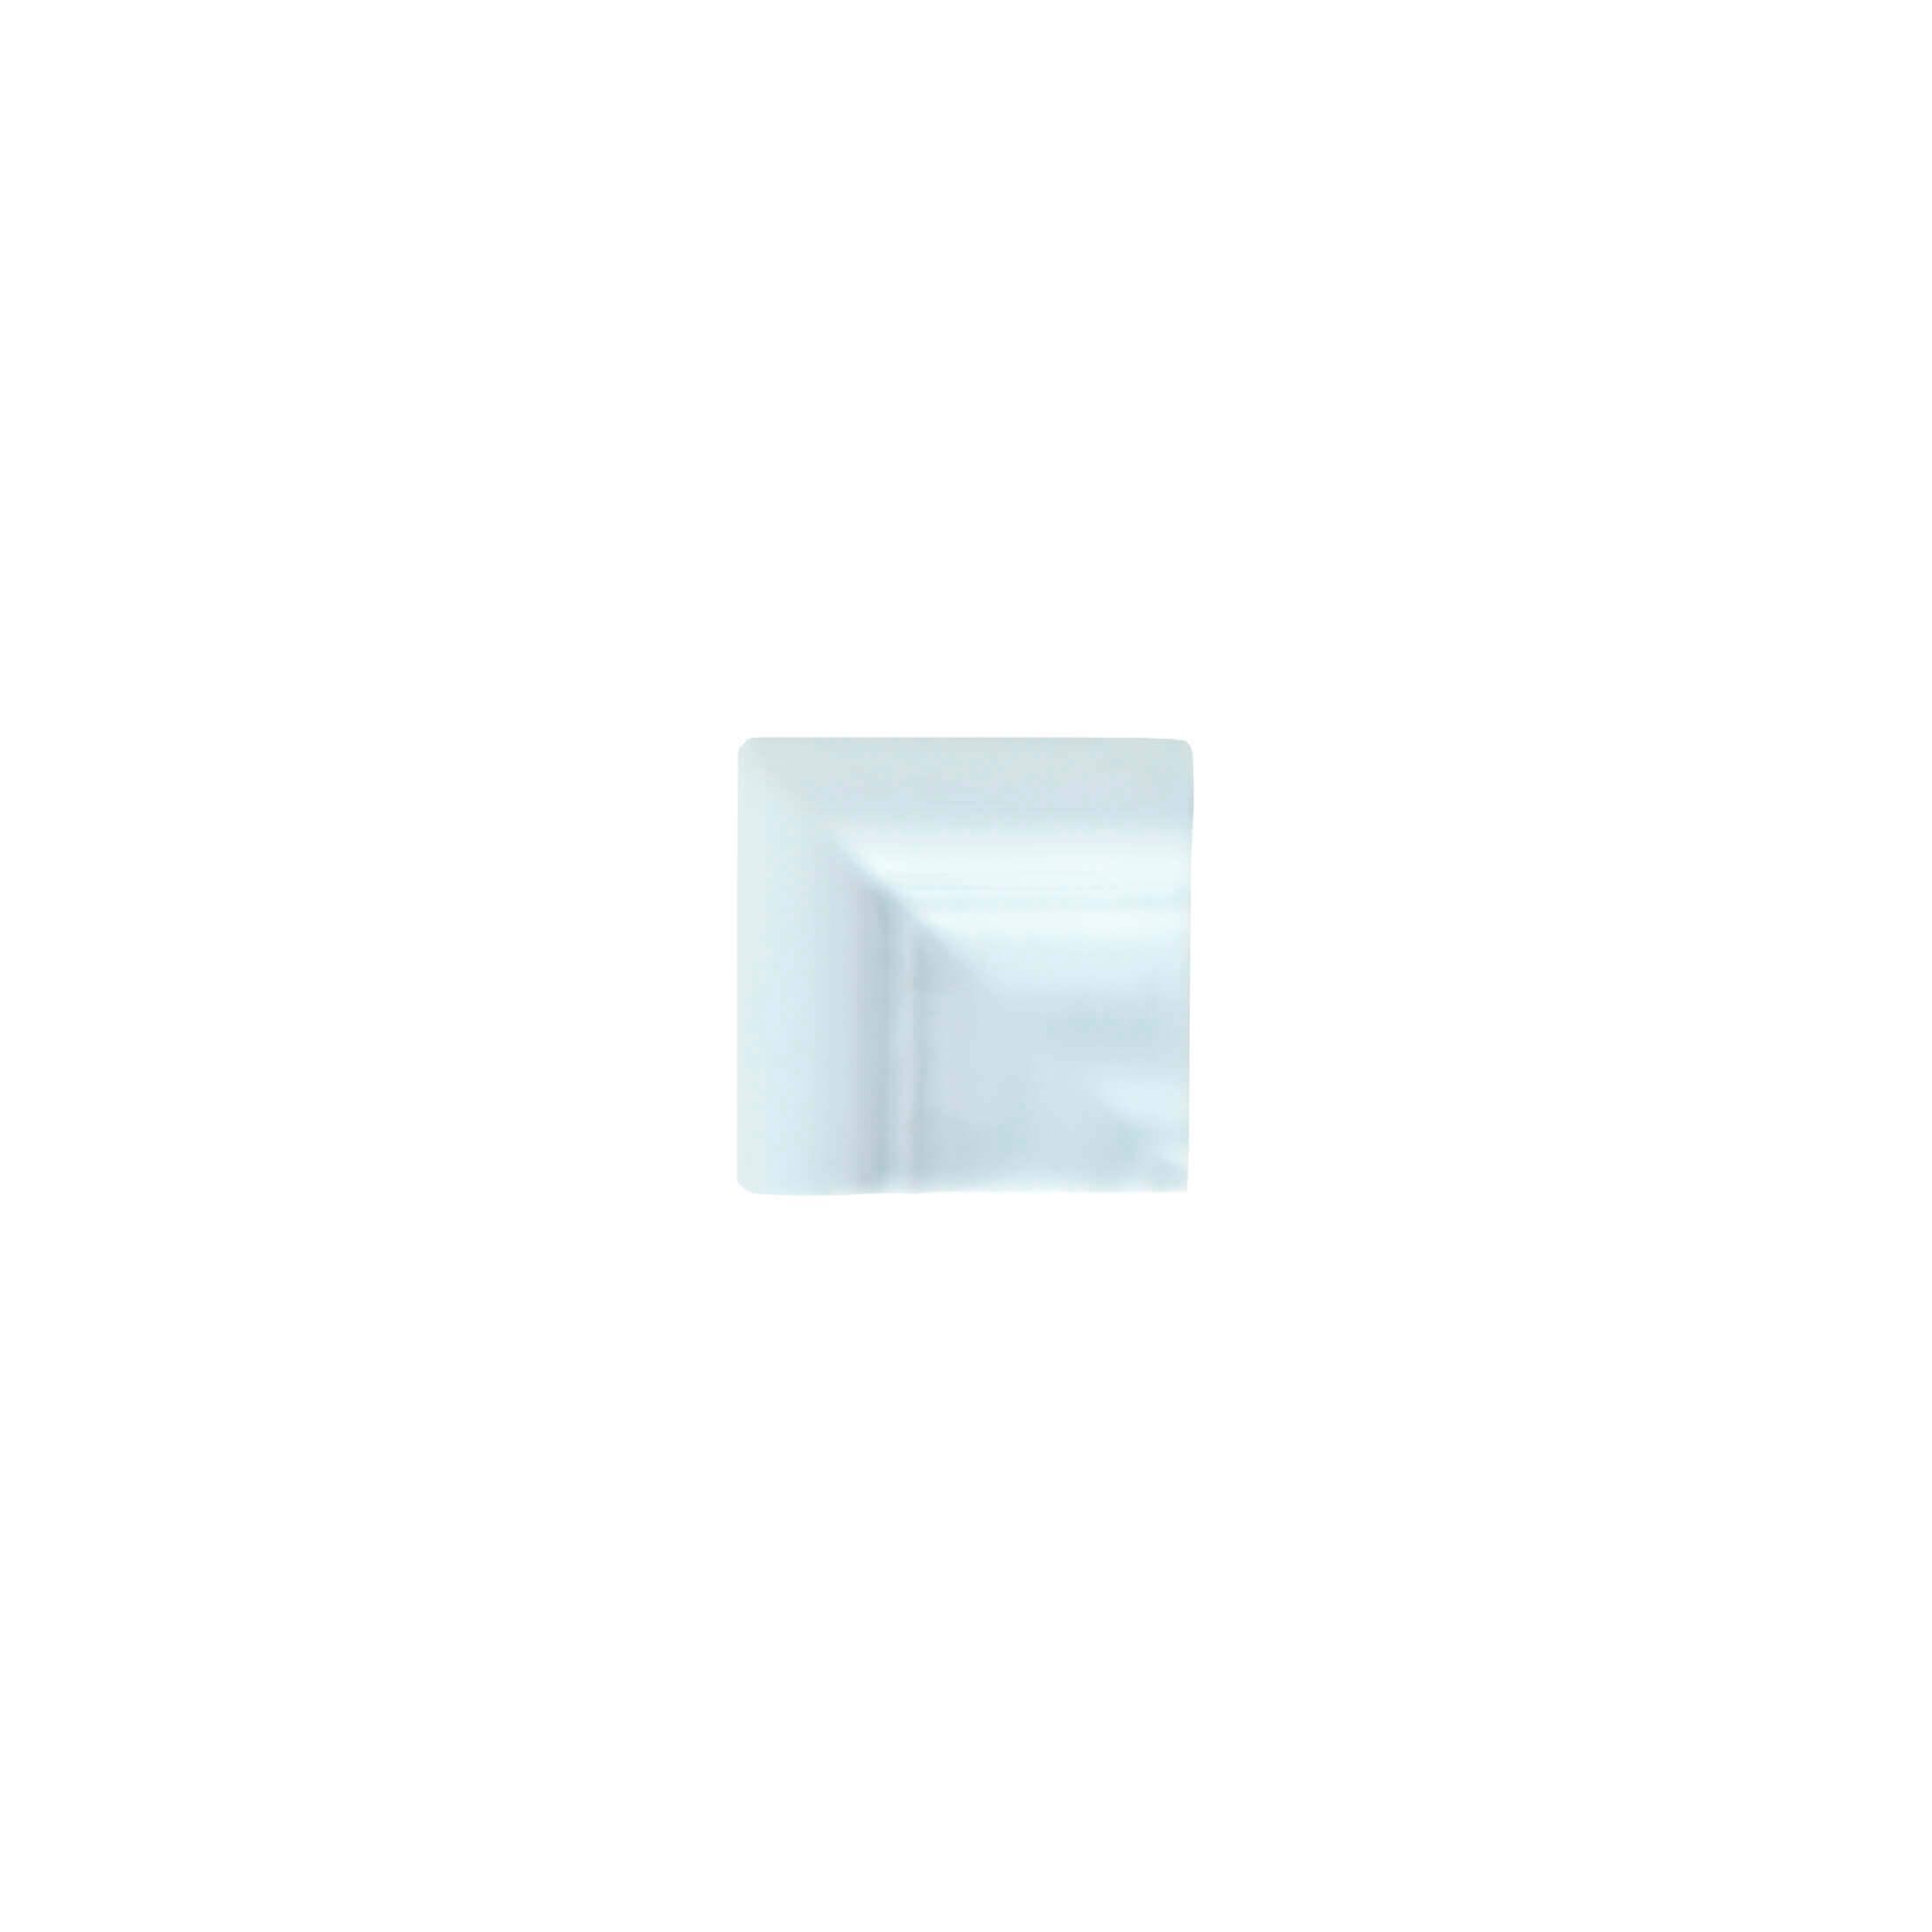 ADST5196 - ANGULO MARCO CORNISA - 7.5 cm X 19.8 cm